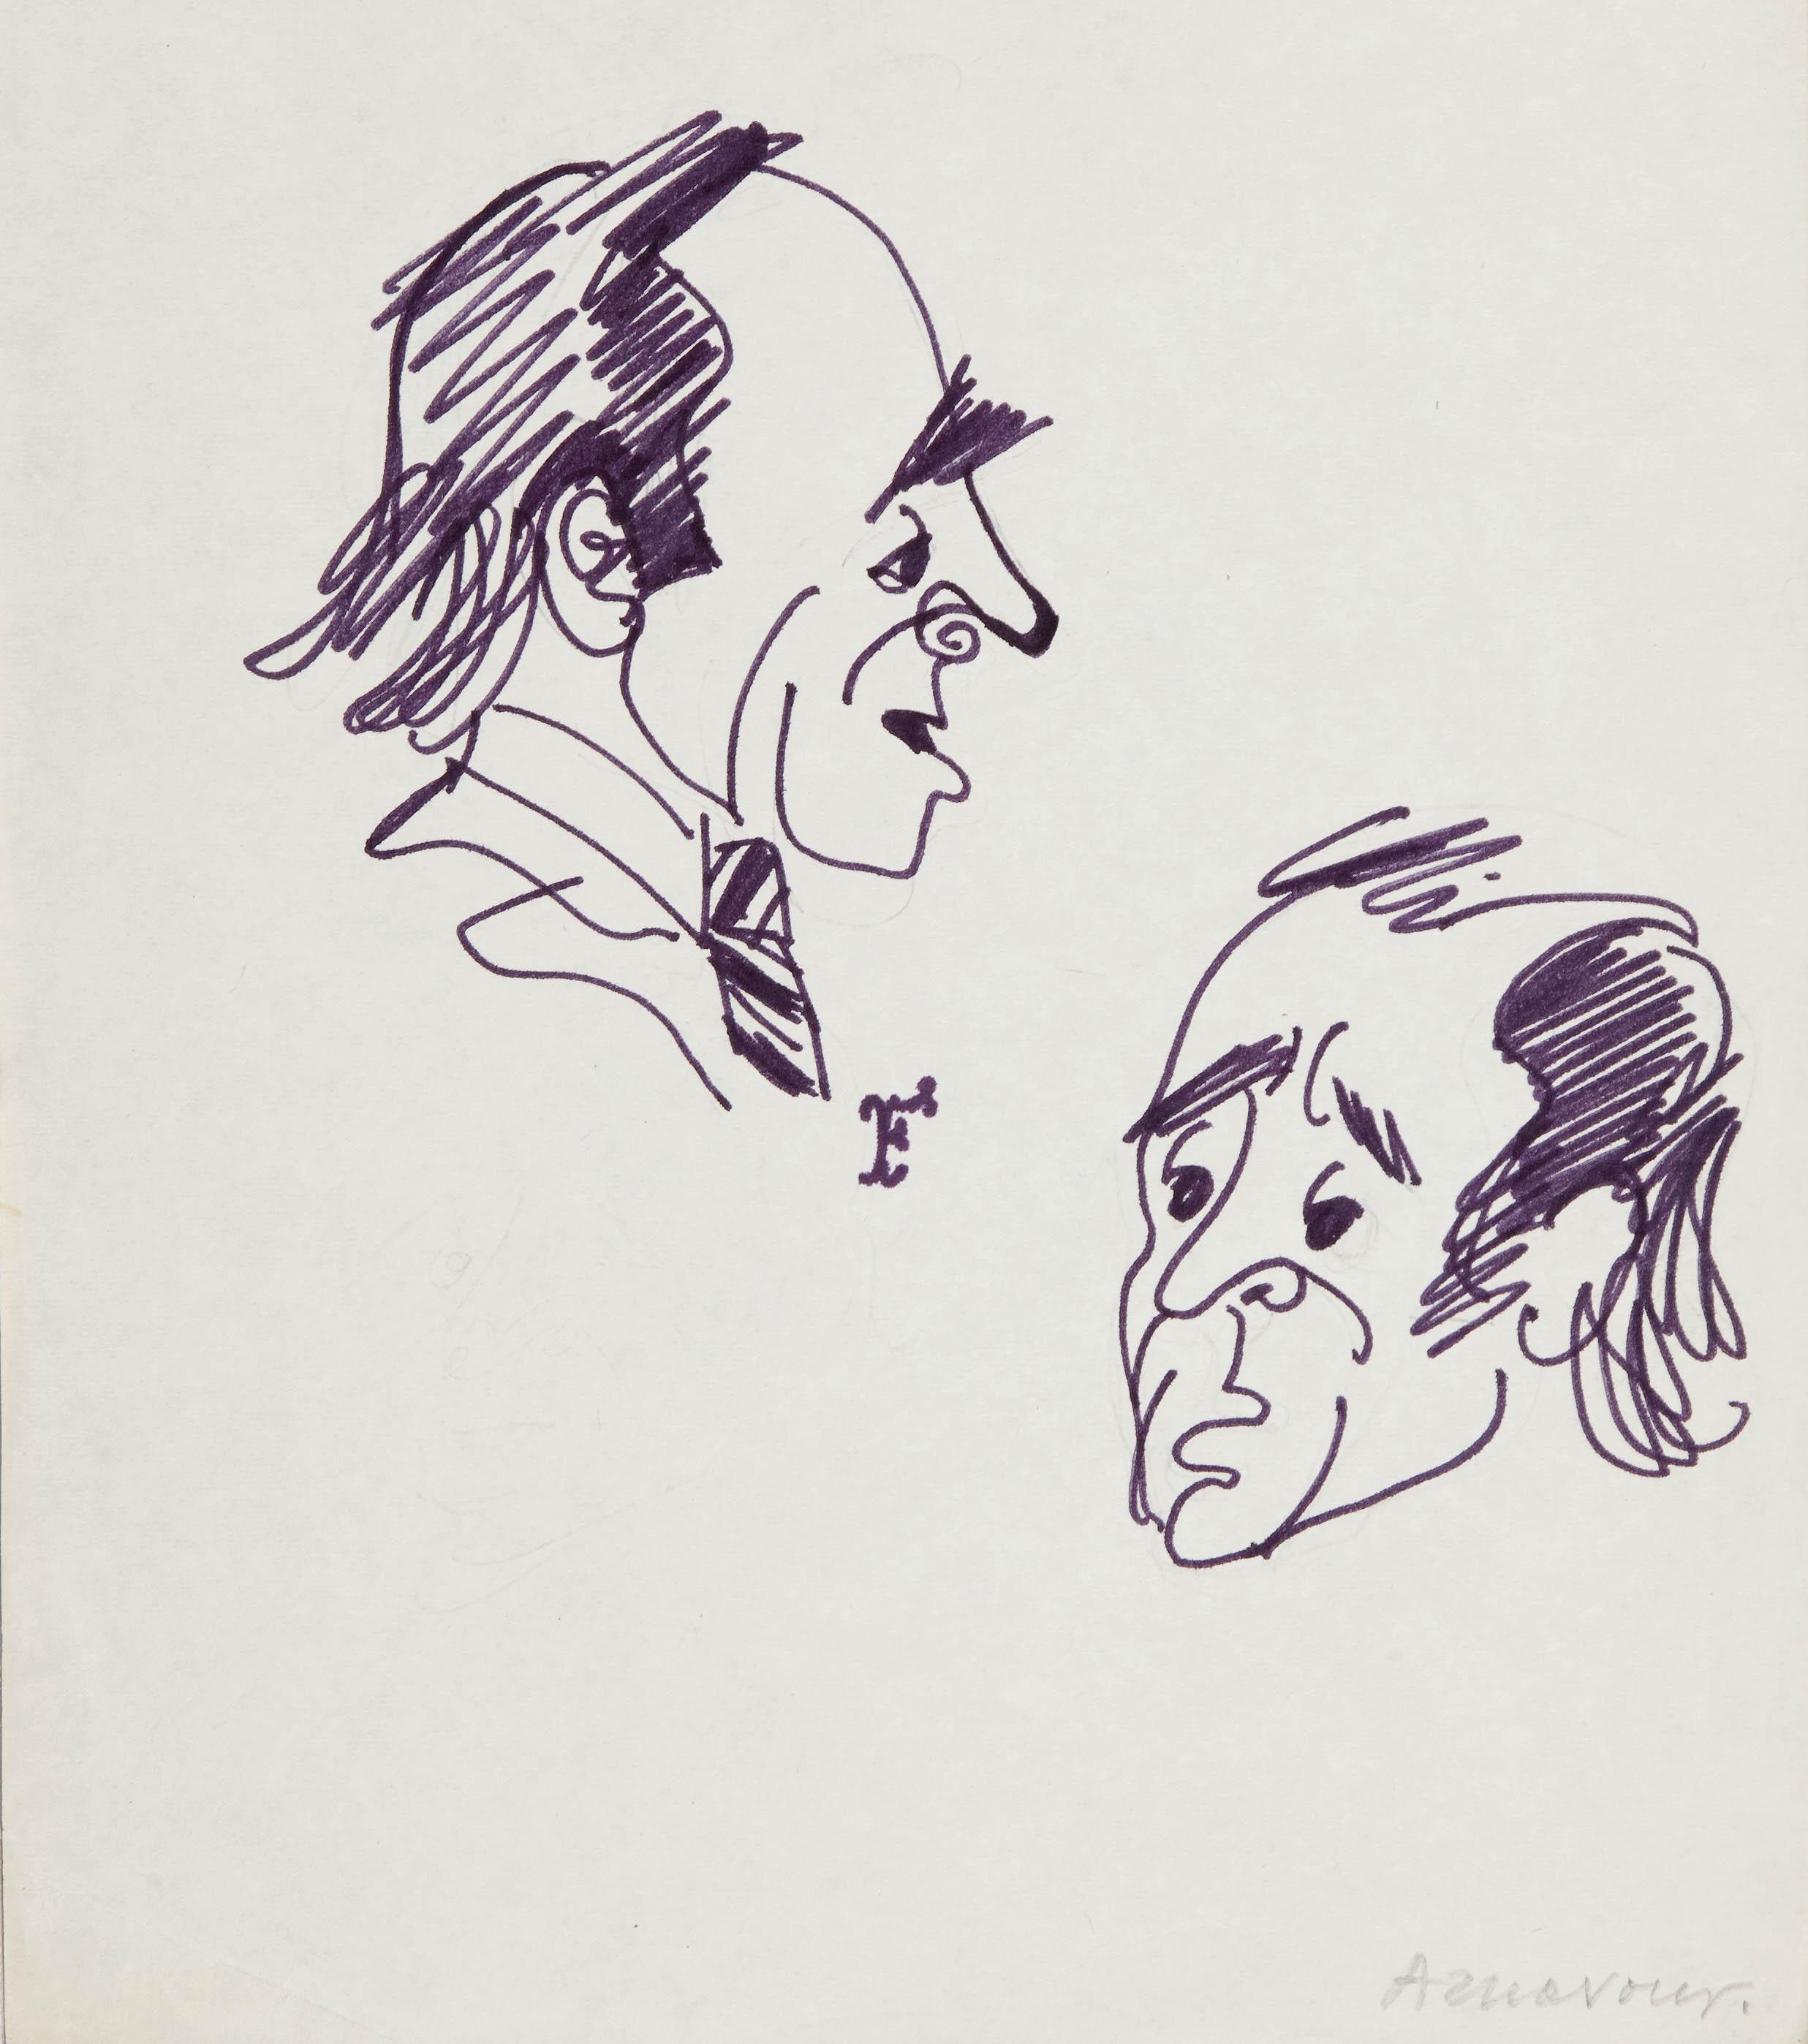 Charles Aznavour, karykatura